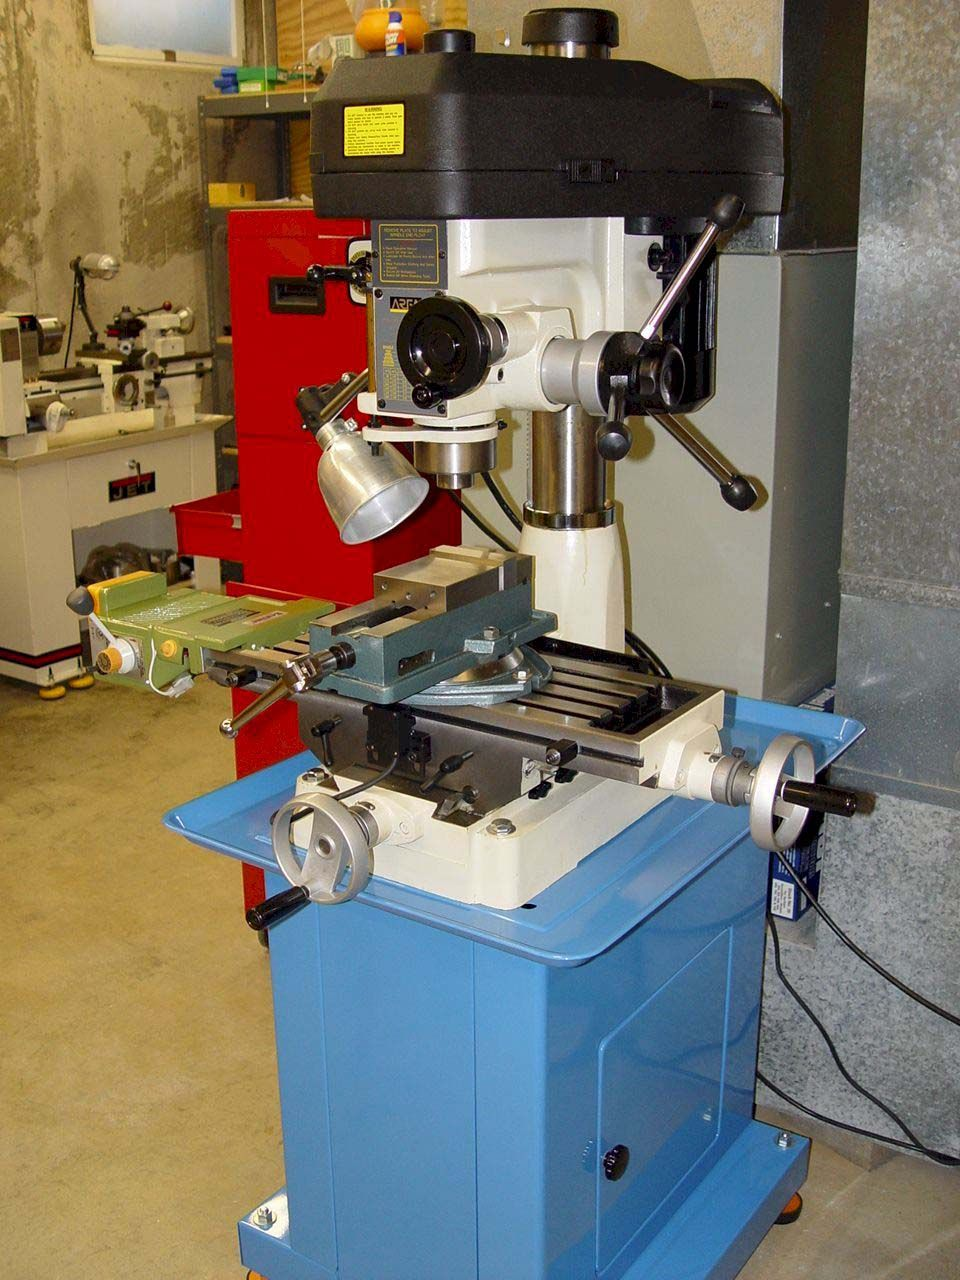 rong fu milling machine